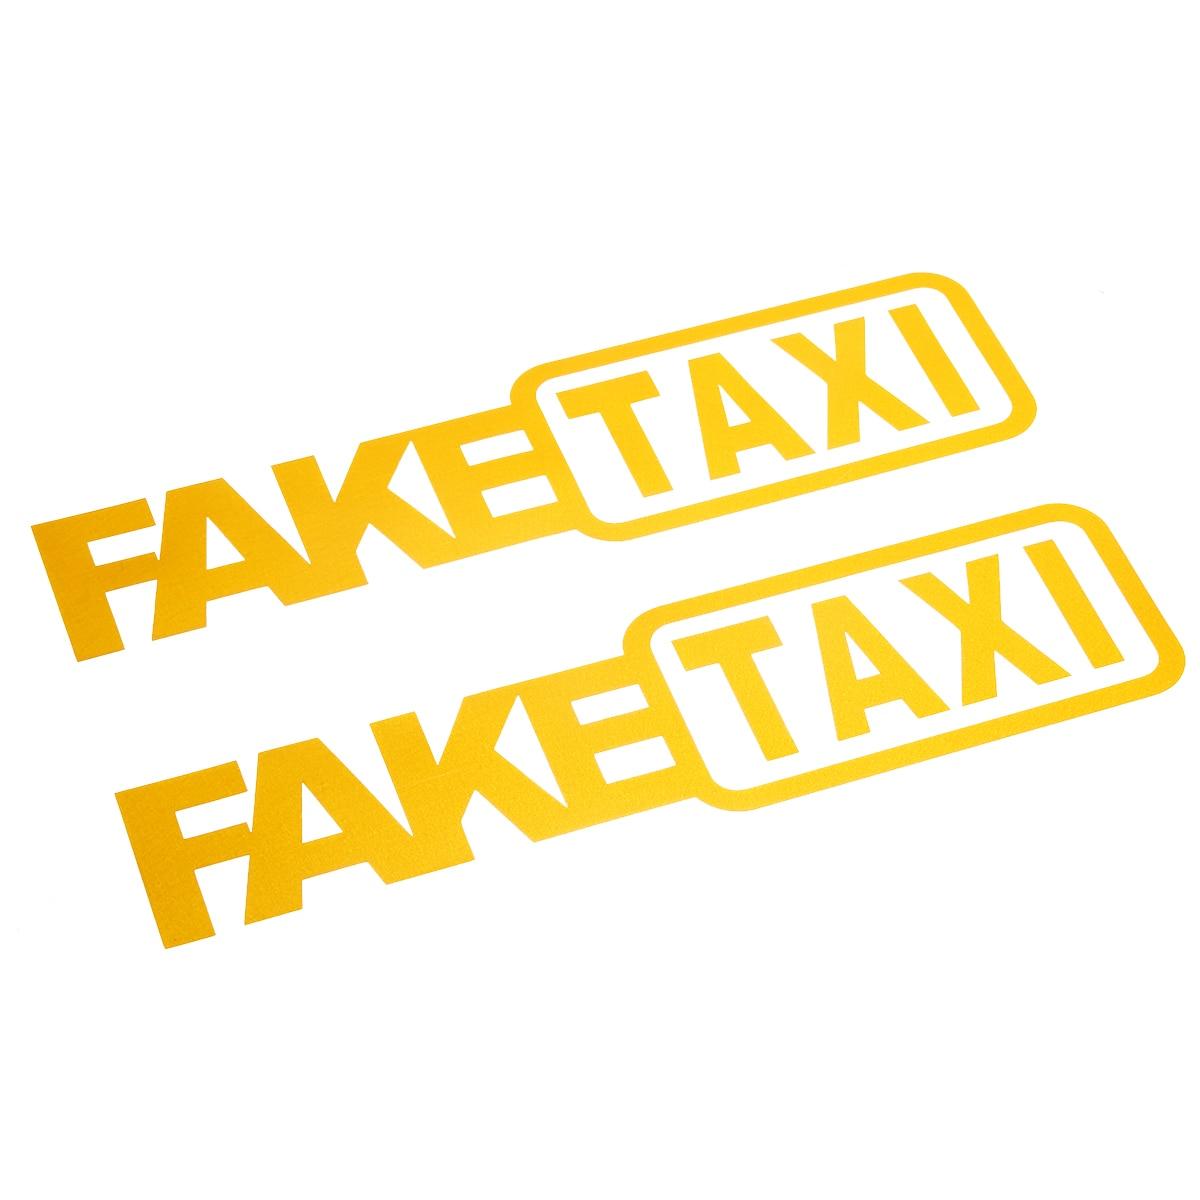 2PCS YELLOW /' FAKE TAXI /' Car Sticker Decal Emblem Self Adhesive Vinyl for Cars